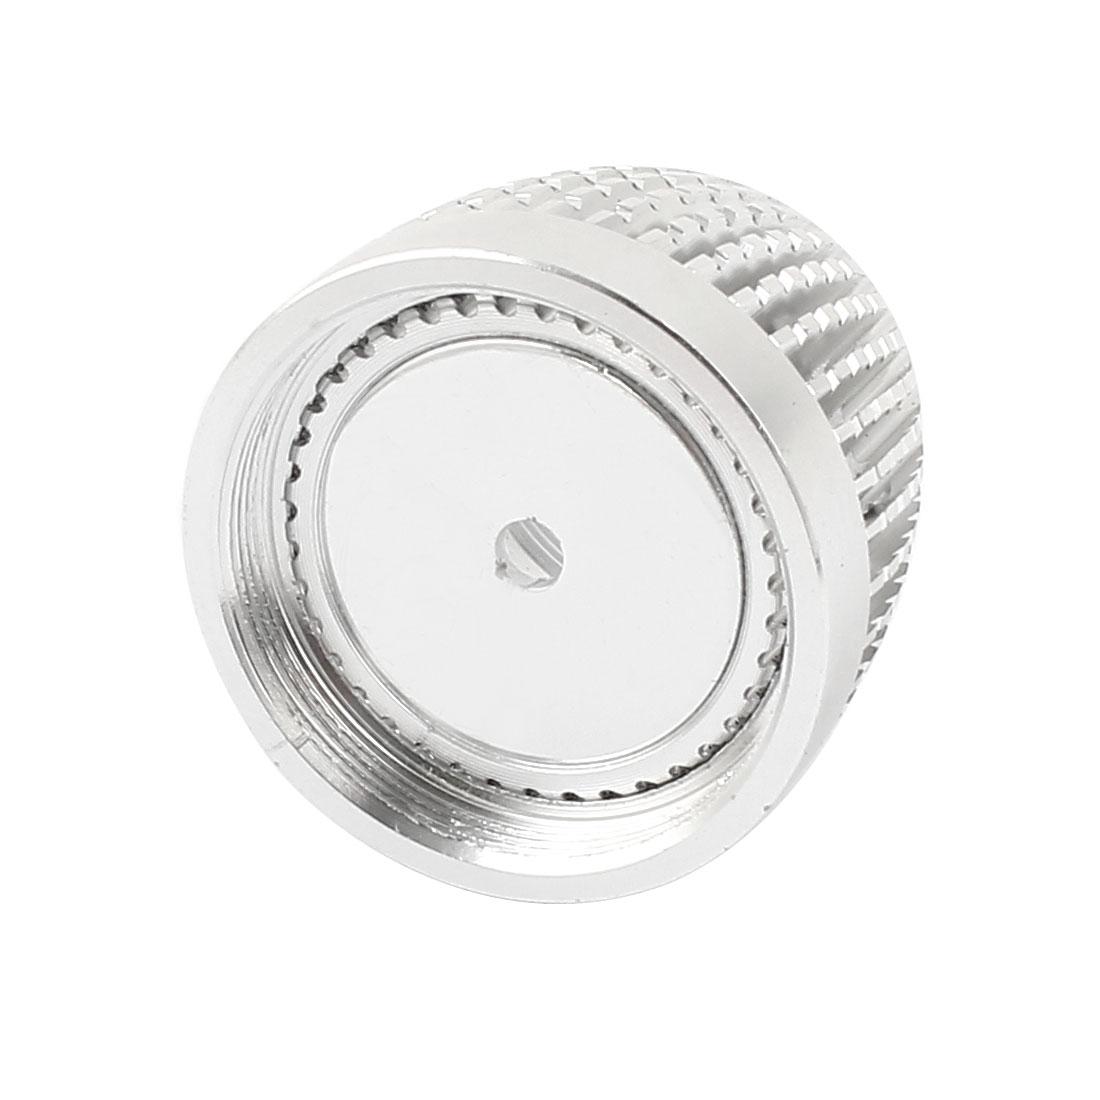 Silver Tone Aluminum Heatsink for LED Bulb Light Lamp Cooling